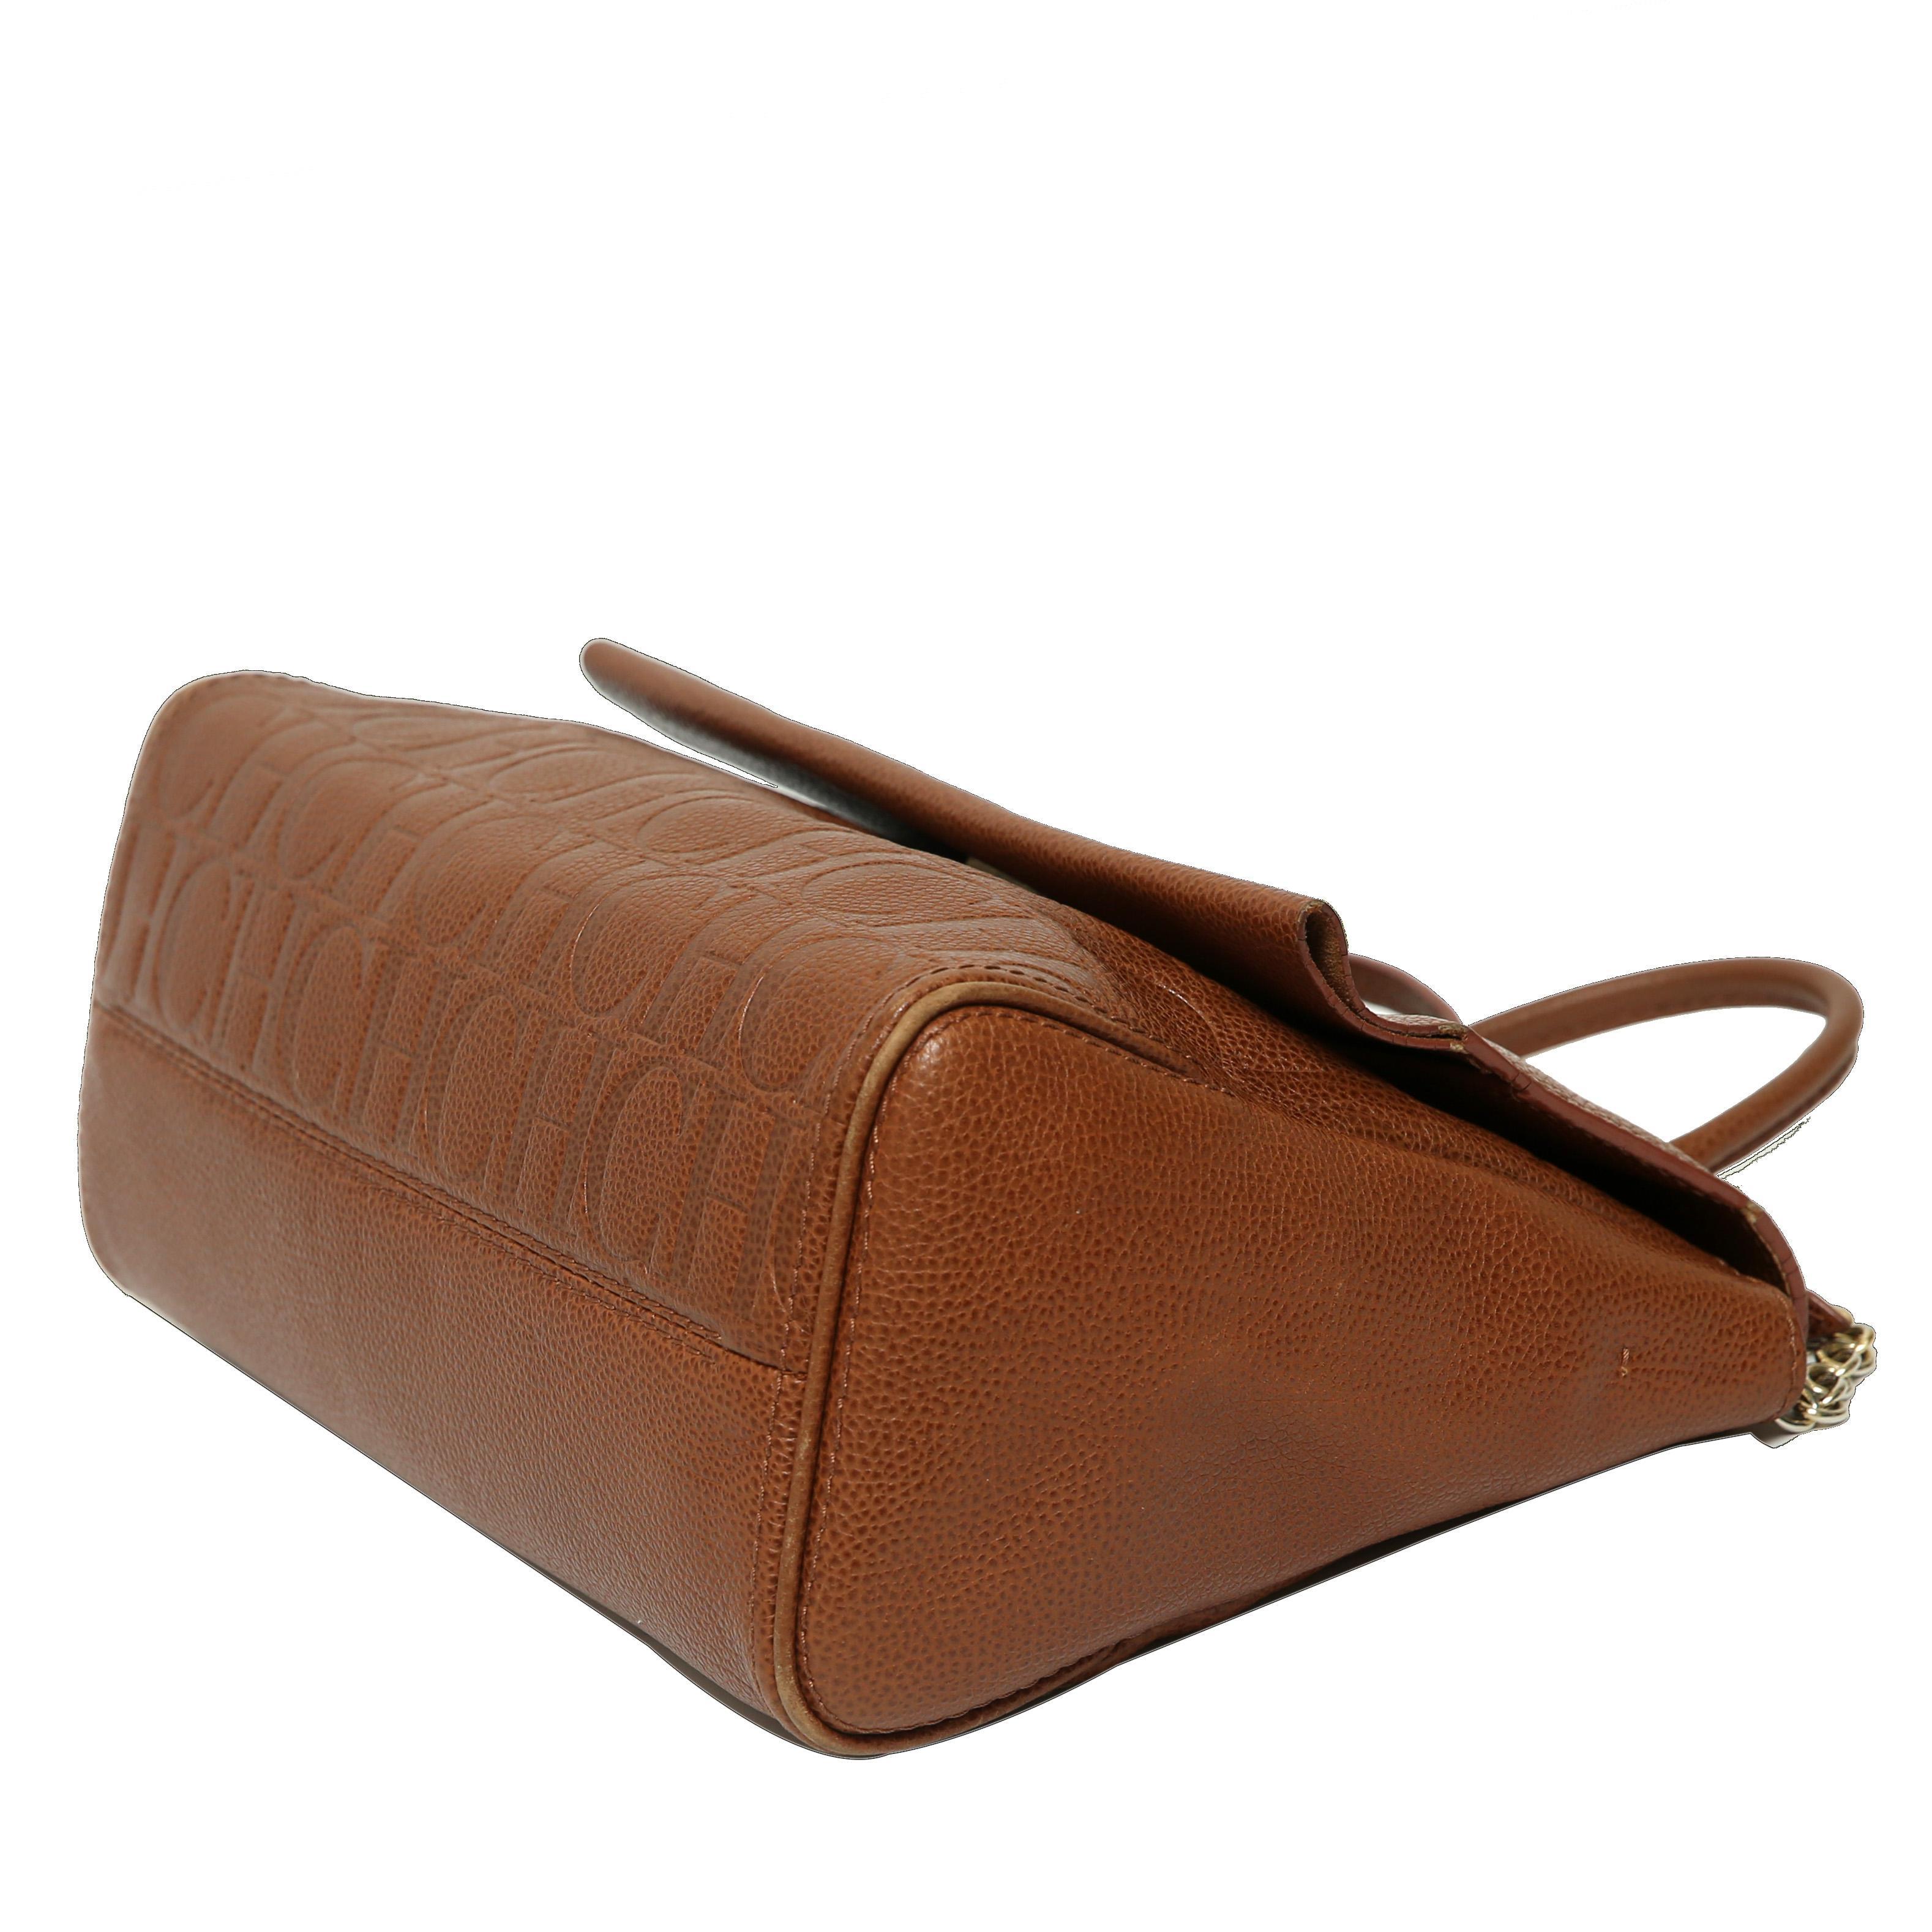 Lyst - Carolina Herrera Leather Minuetto Flap Bag in Brown ff9a038d0fb9b